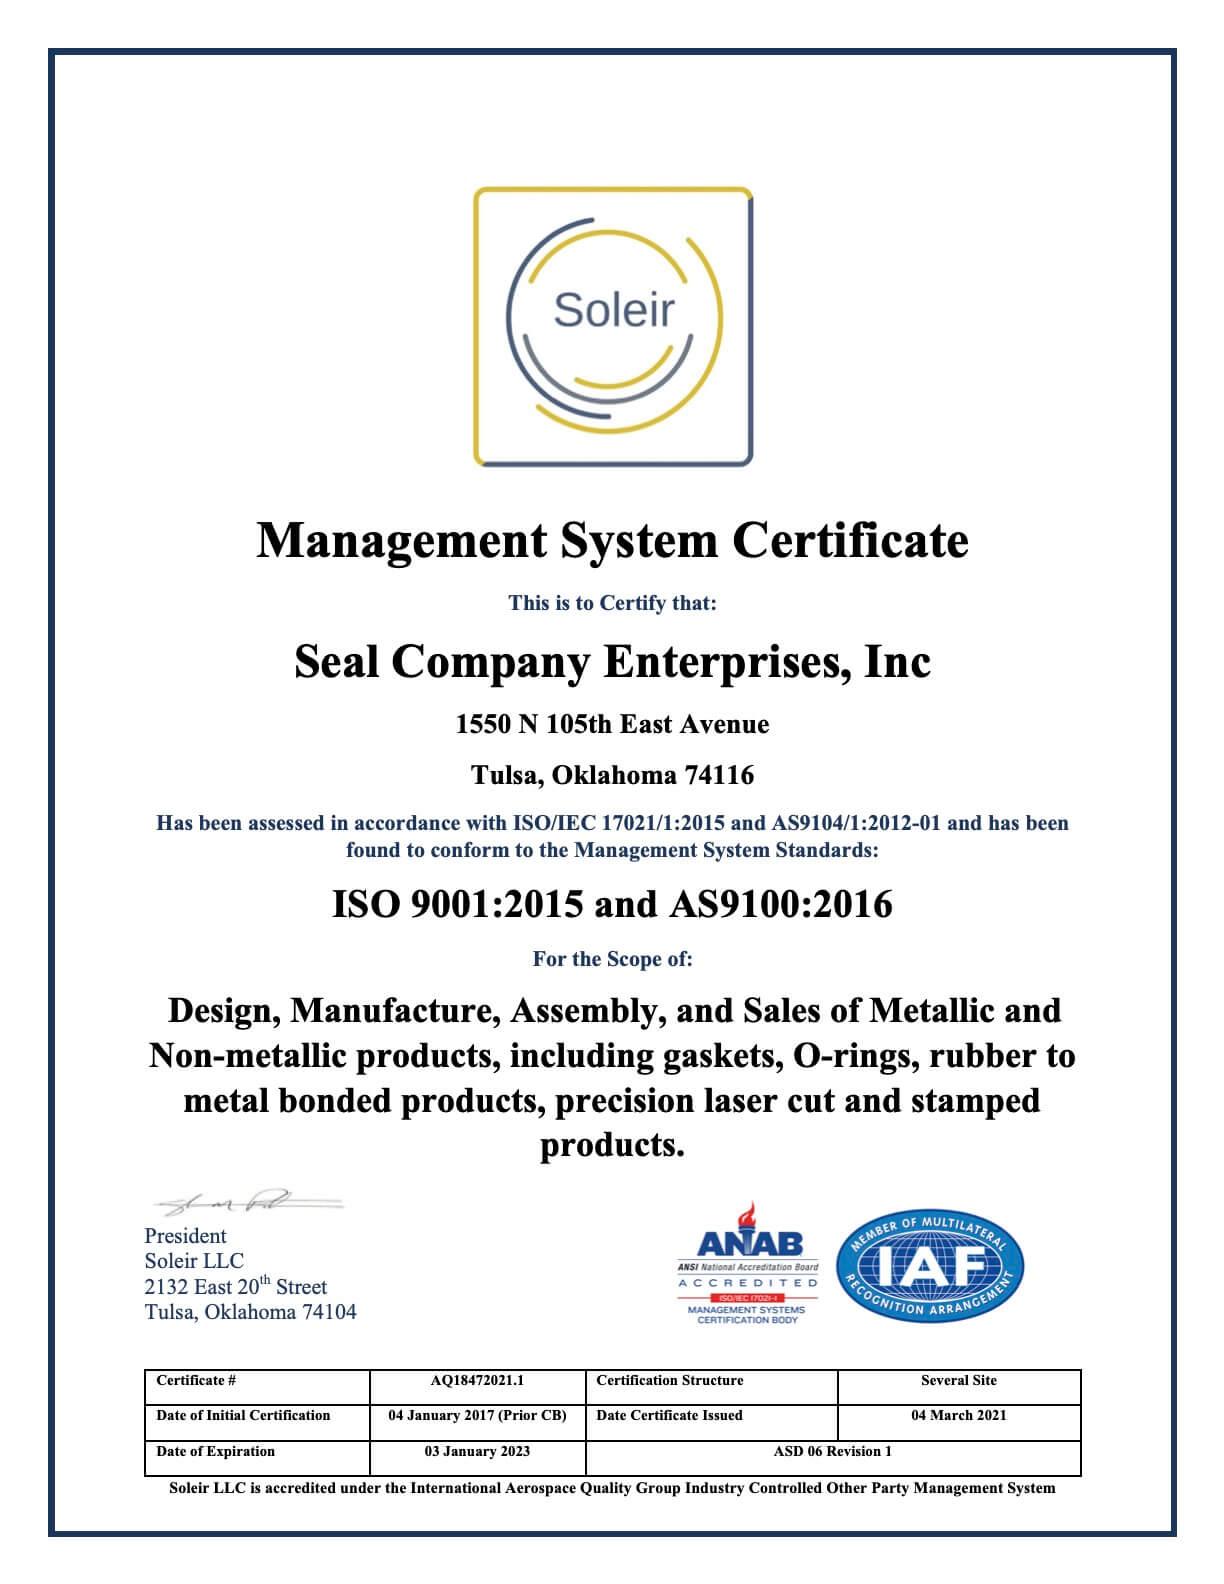 Seal Company Enterprises Inc 2021 AS9100 Management System Certificate